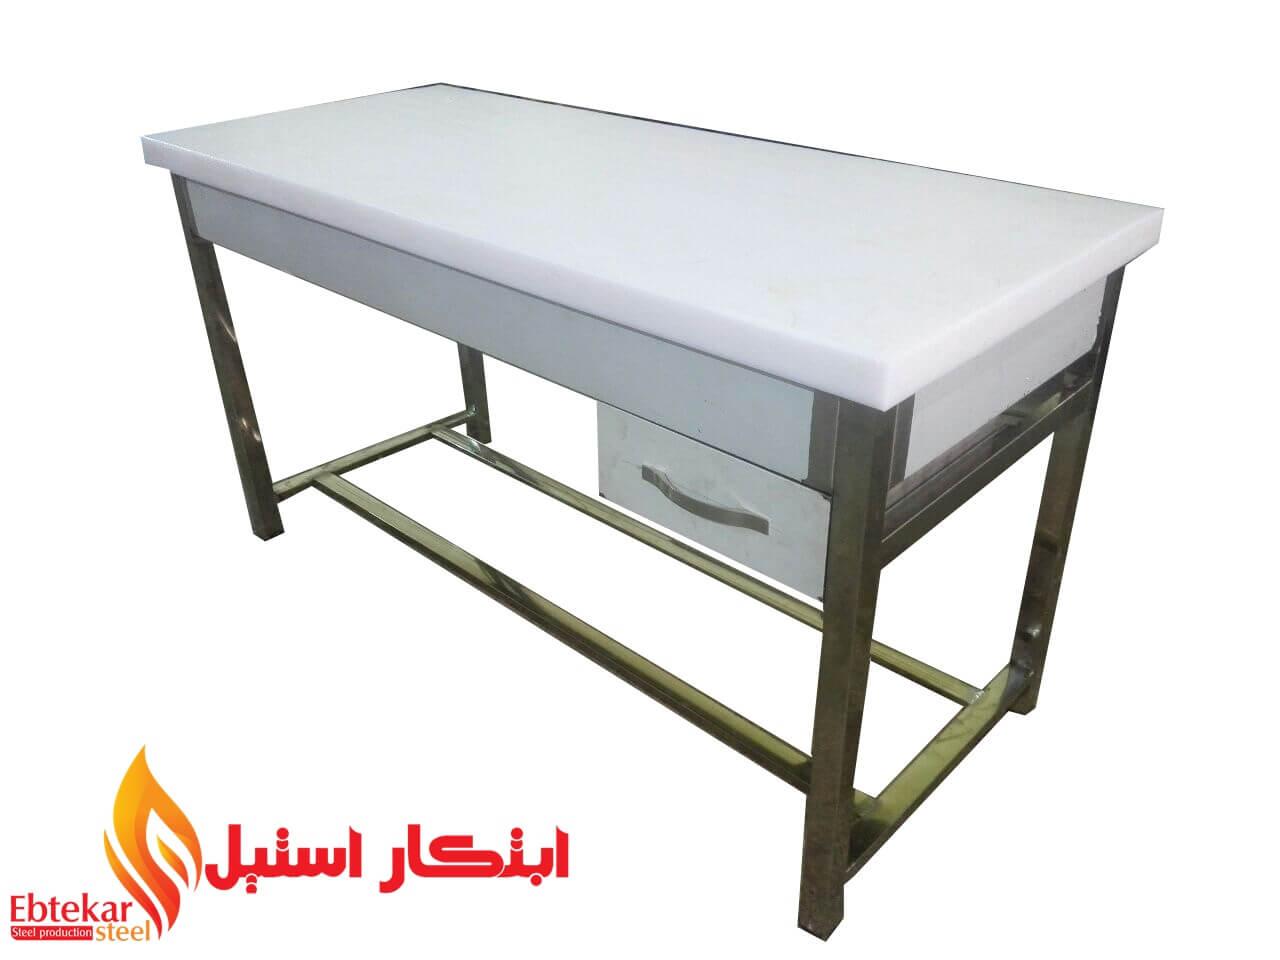 میز کار پلی اتیلن یک متری